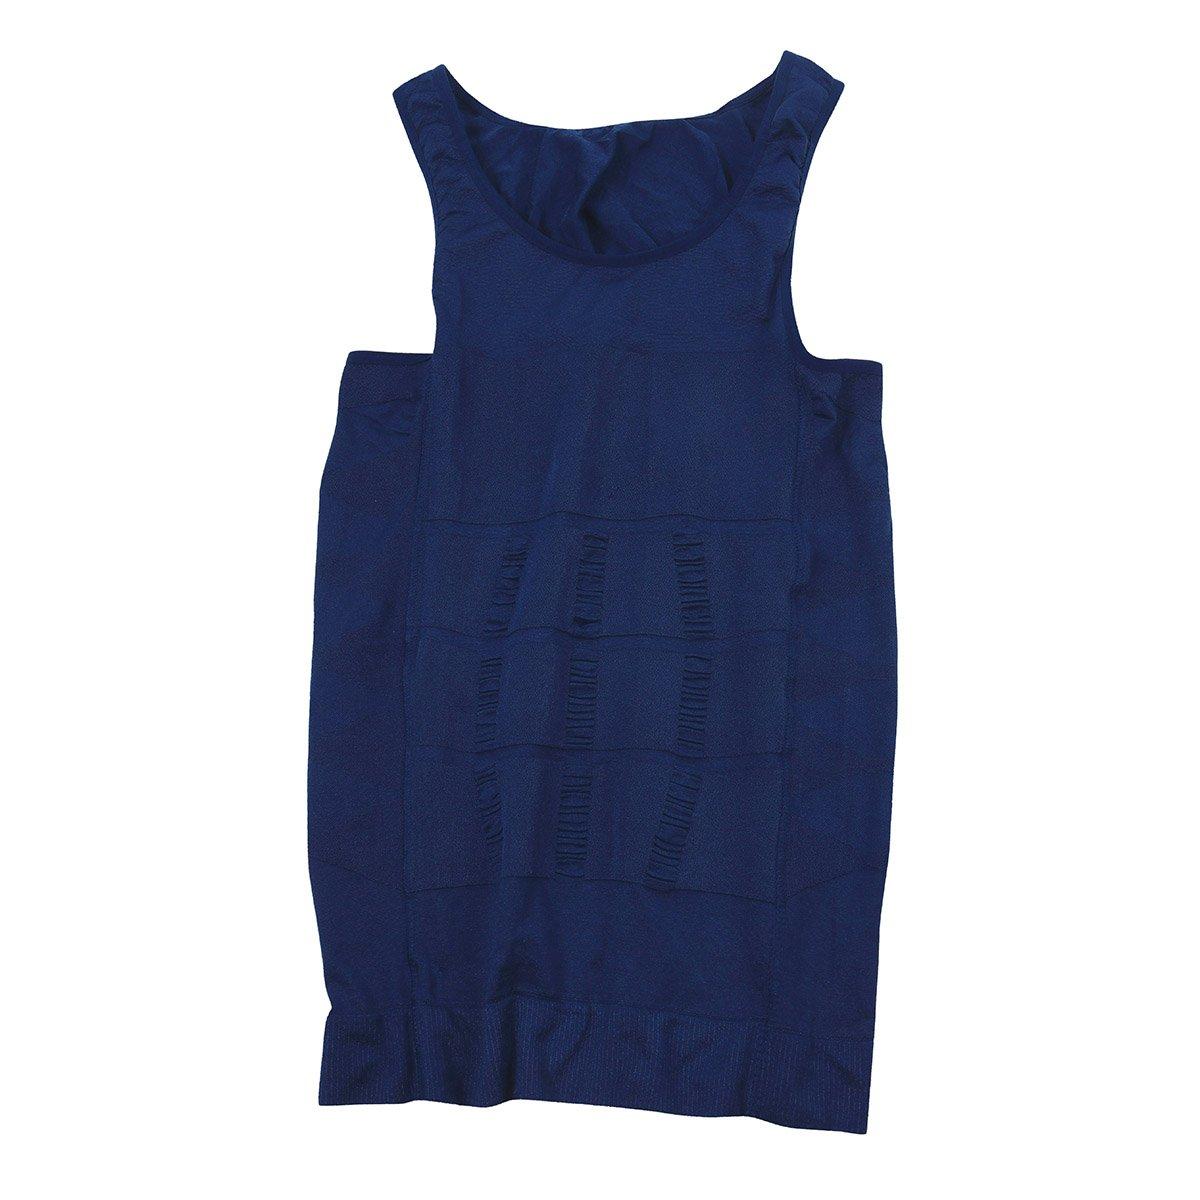 TiaoBug Mens Body Shaper Abdomen Muscle Compression Shapewear Slimming Fatty Vest Shirt